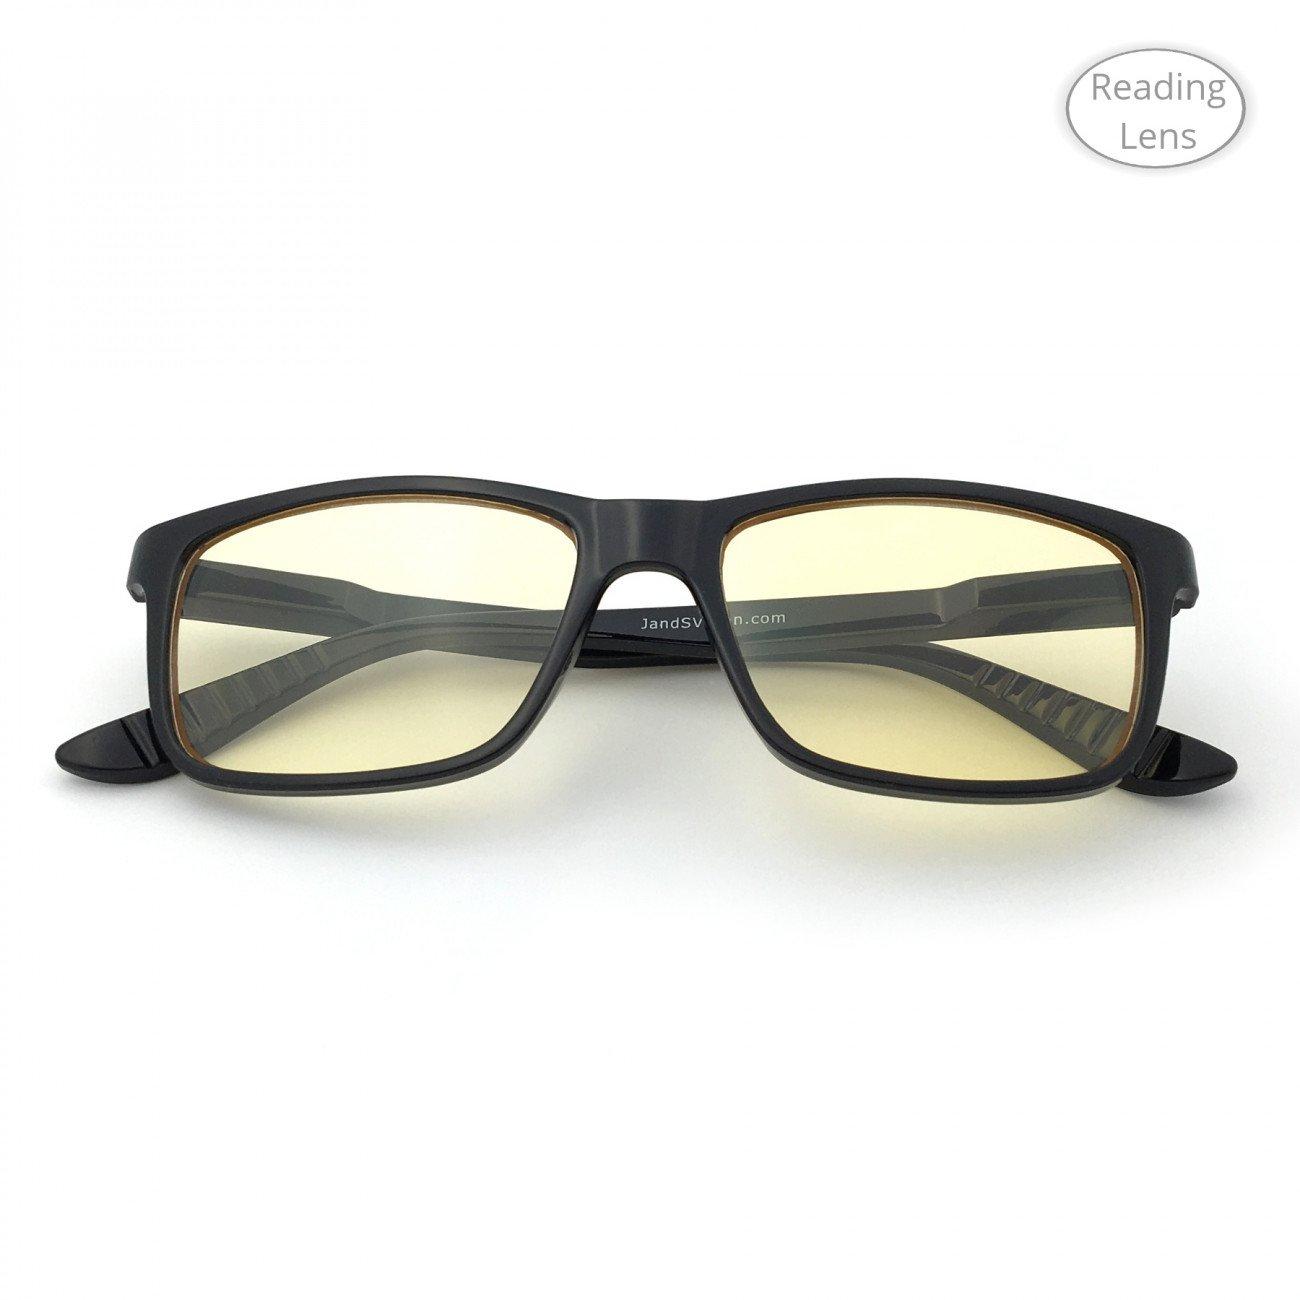 ef52ebb2bb39 Blue Light Shield Computer Tablet Reading Glasses – Classic Rectangle Frame